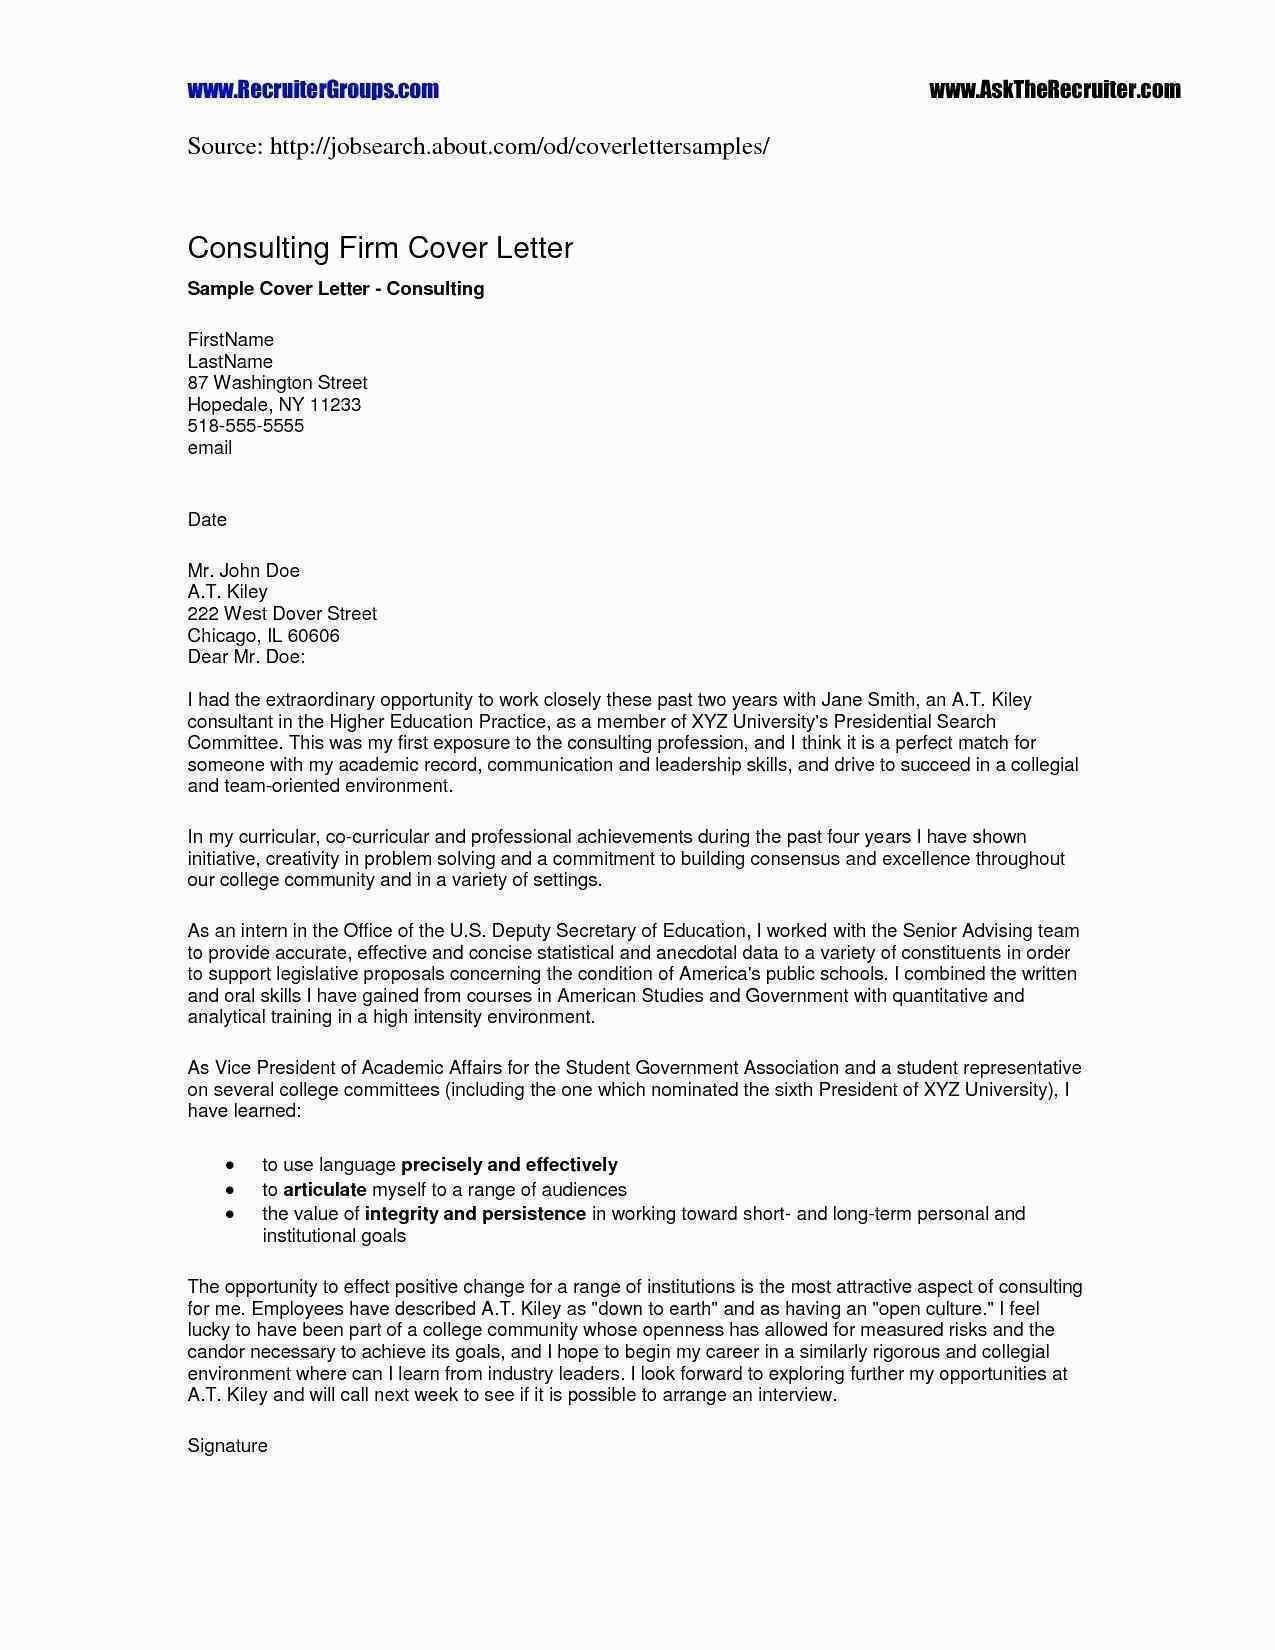 Business Plan Template social Enterprise Cover letter